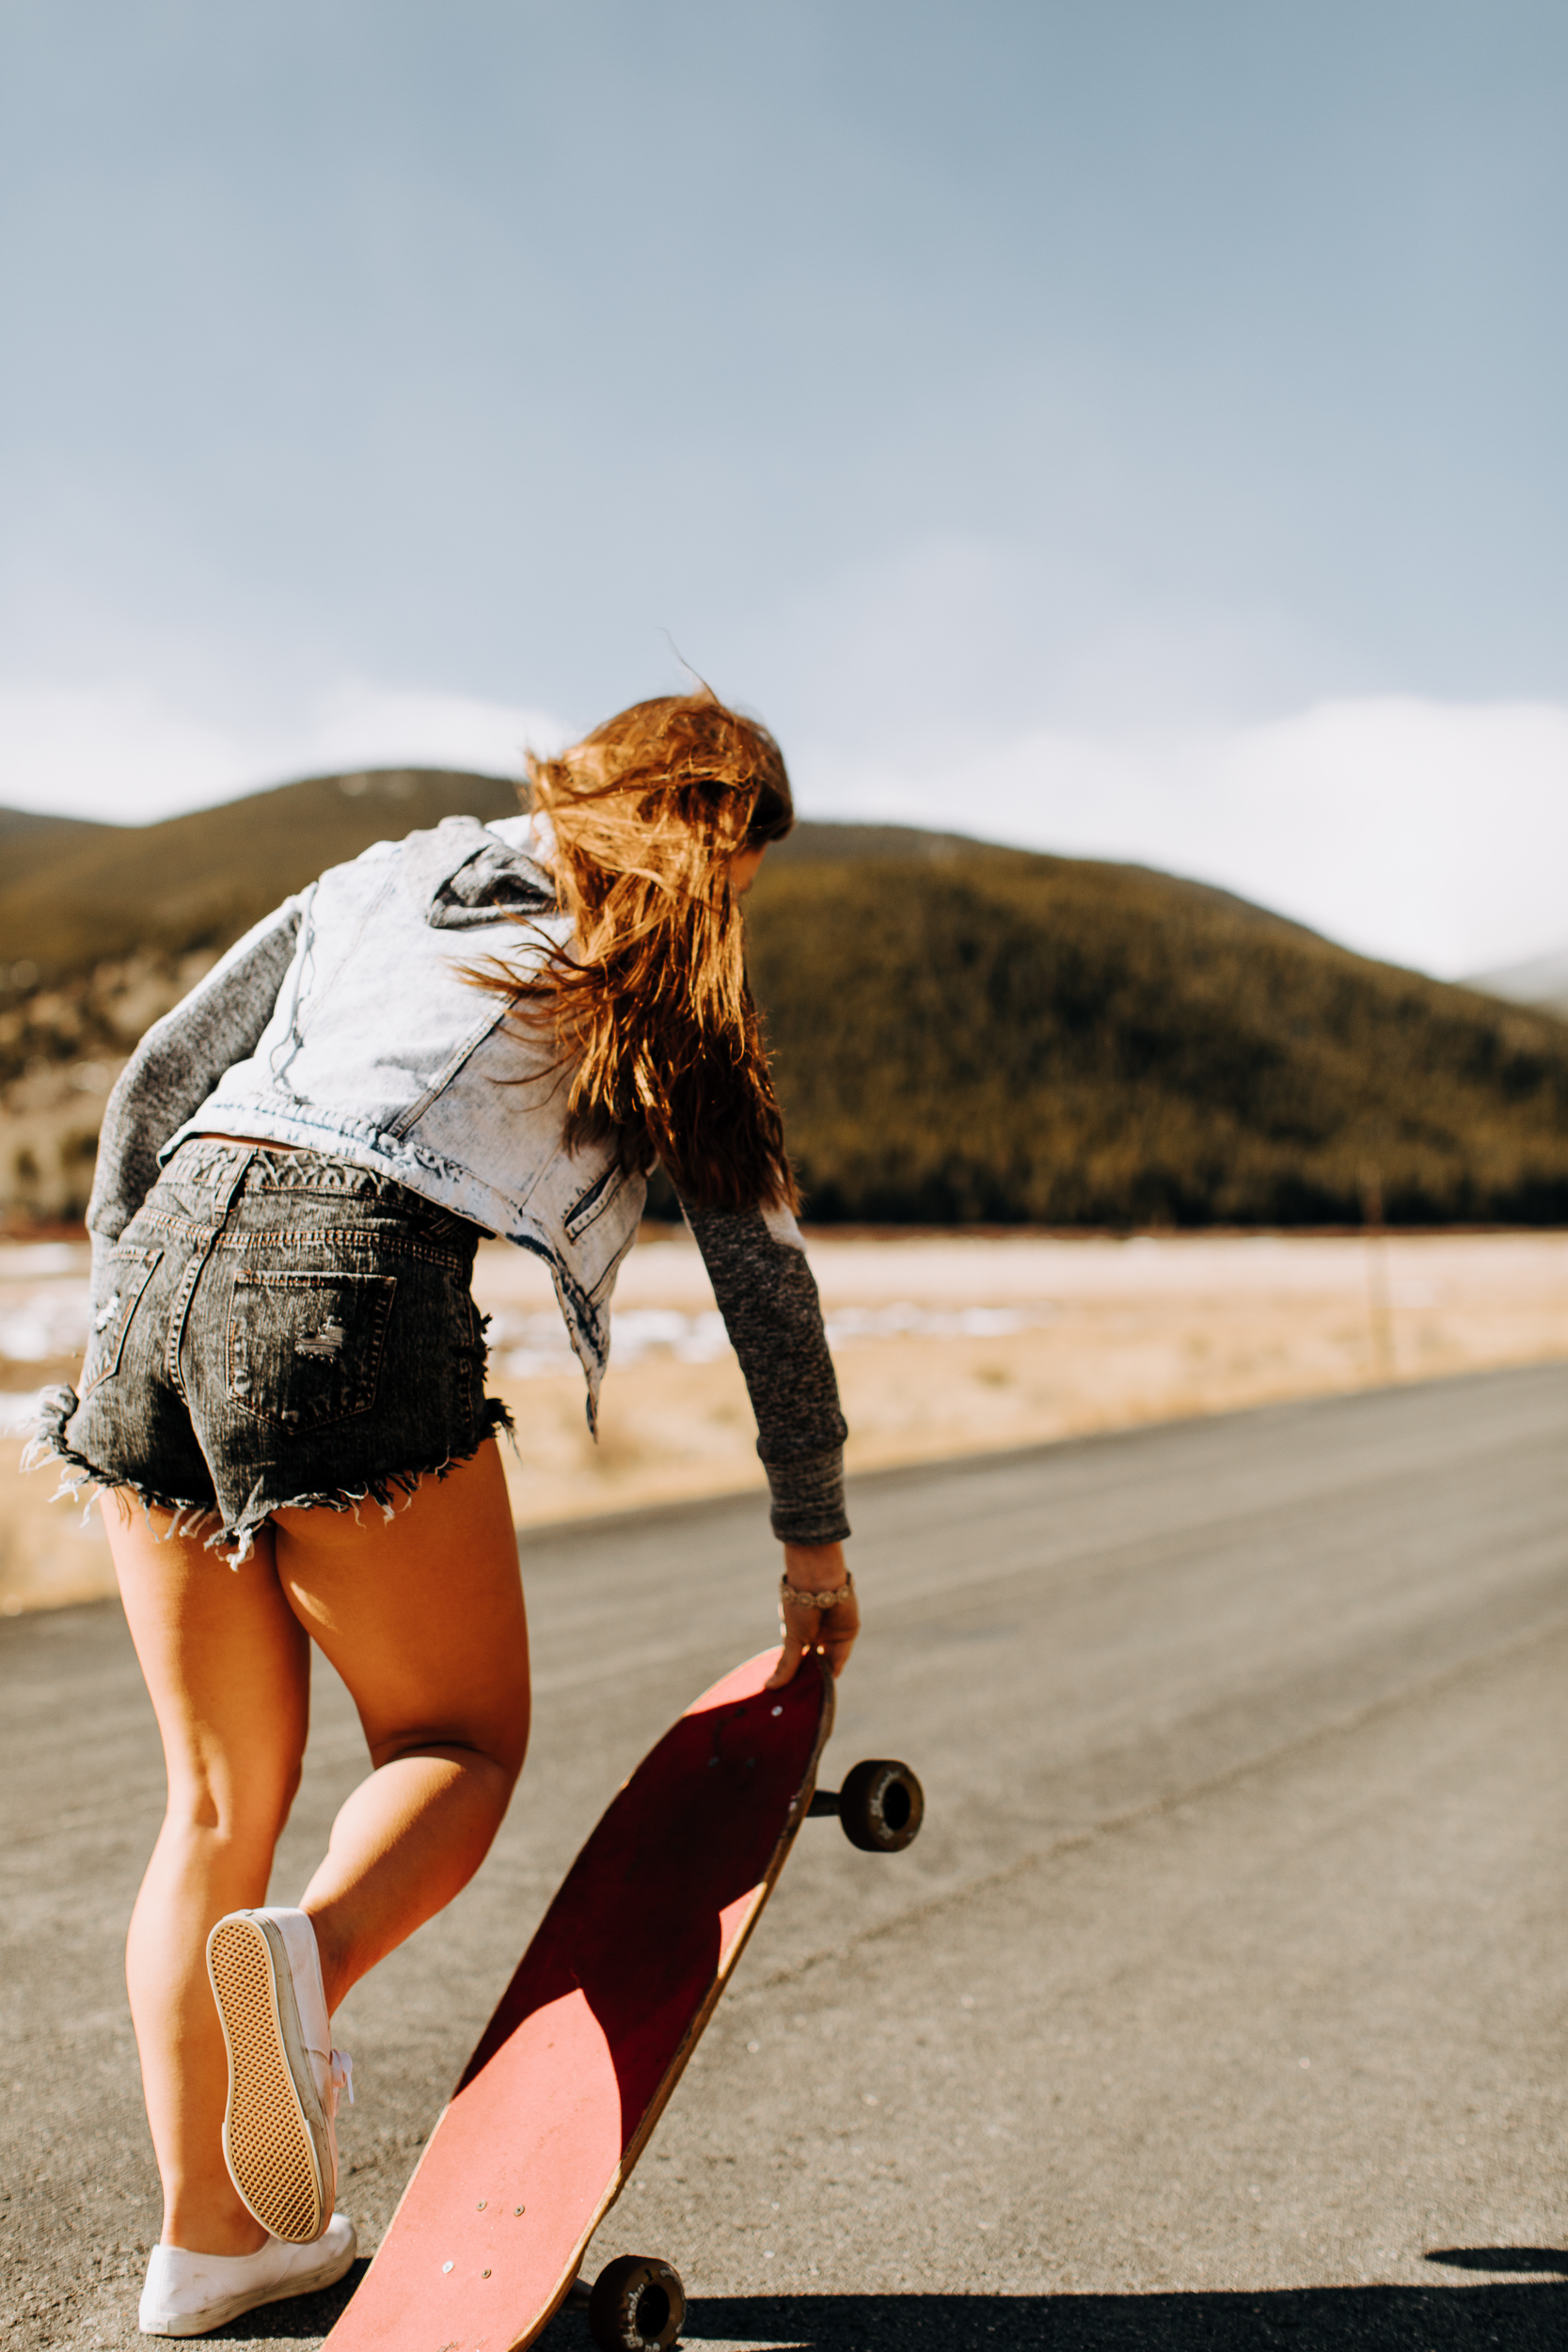 Guanella Pass Skateboarding Photoshoot with Memory   Colorado Adventures